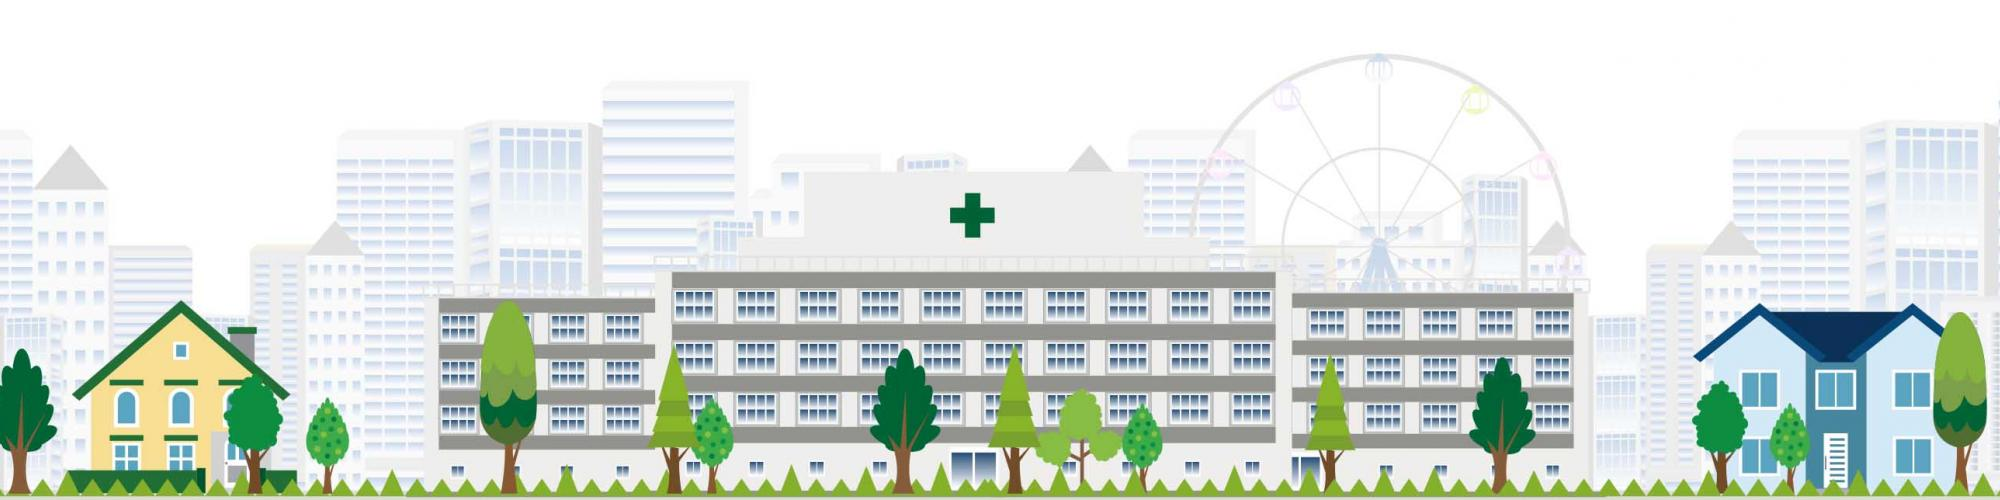 Helios Klinikum Erfurt